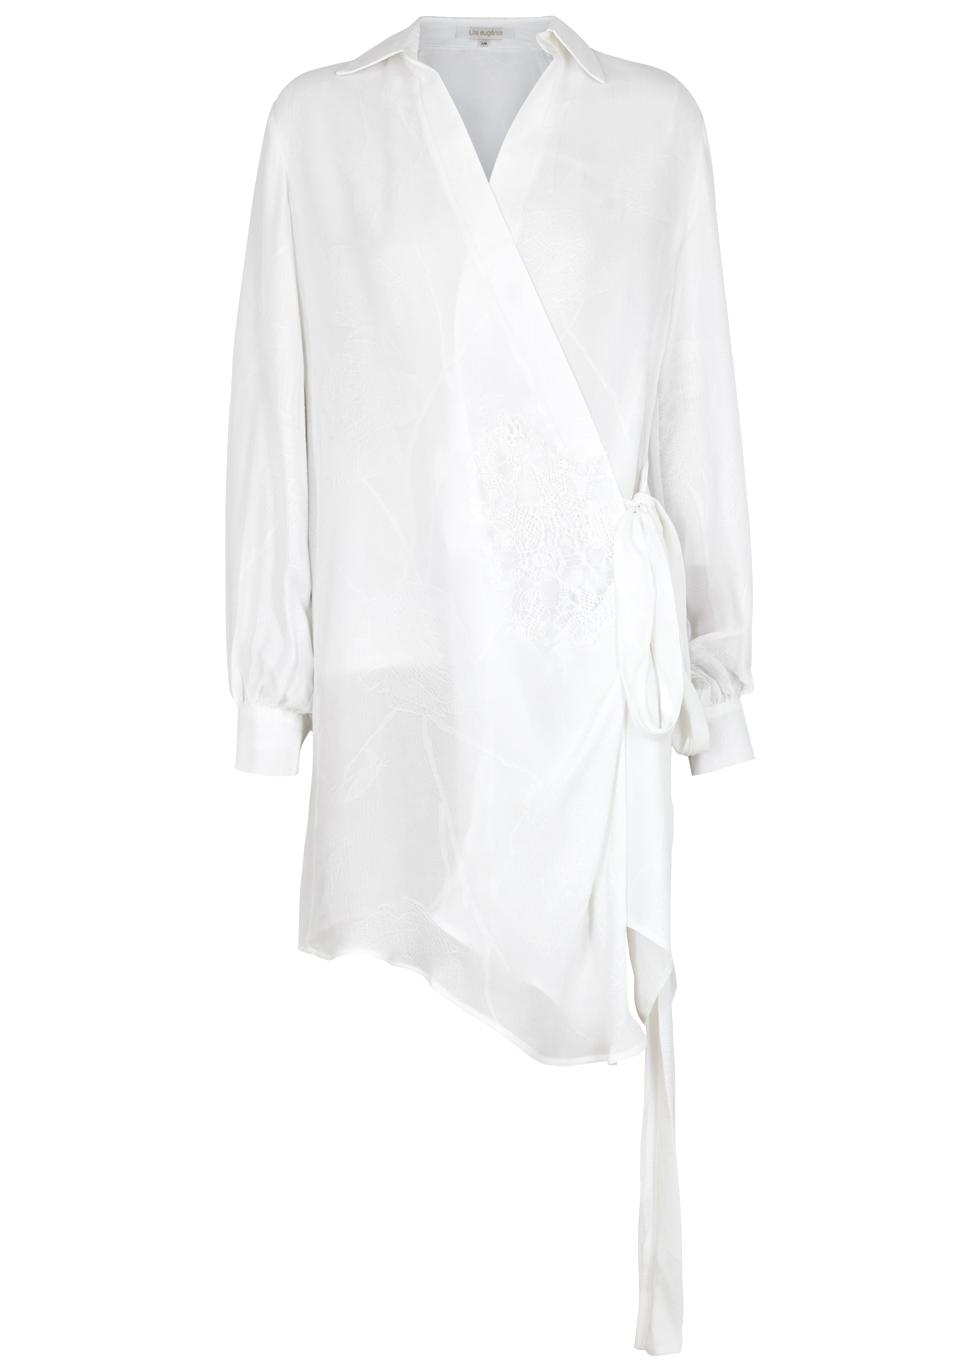 LILA.EUGENIE Lila. Eugénie White Floral-Jacquard Voile Wrap Dress